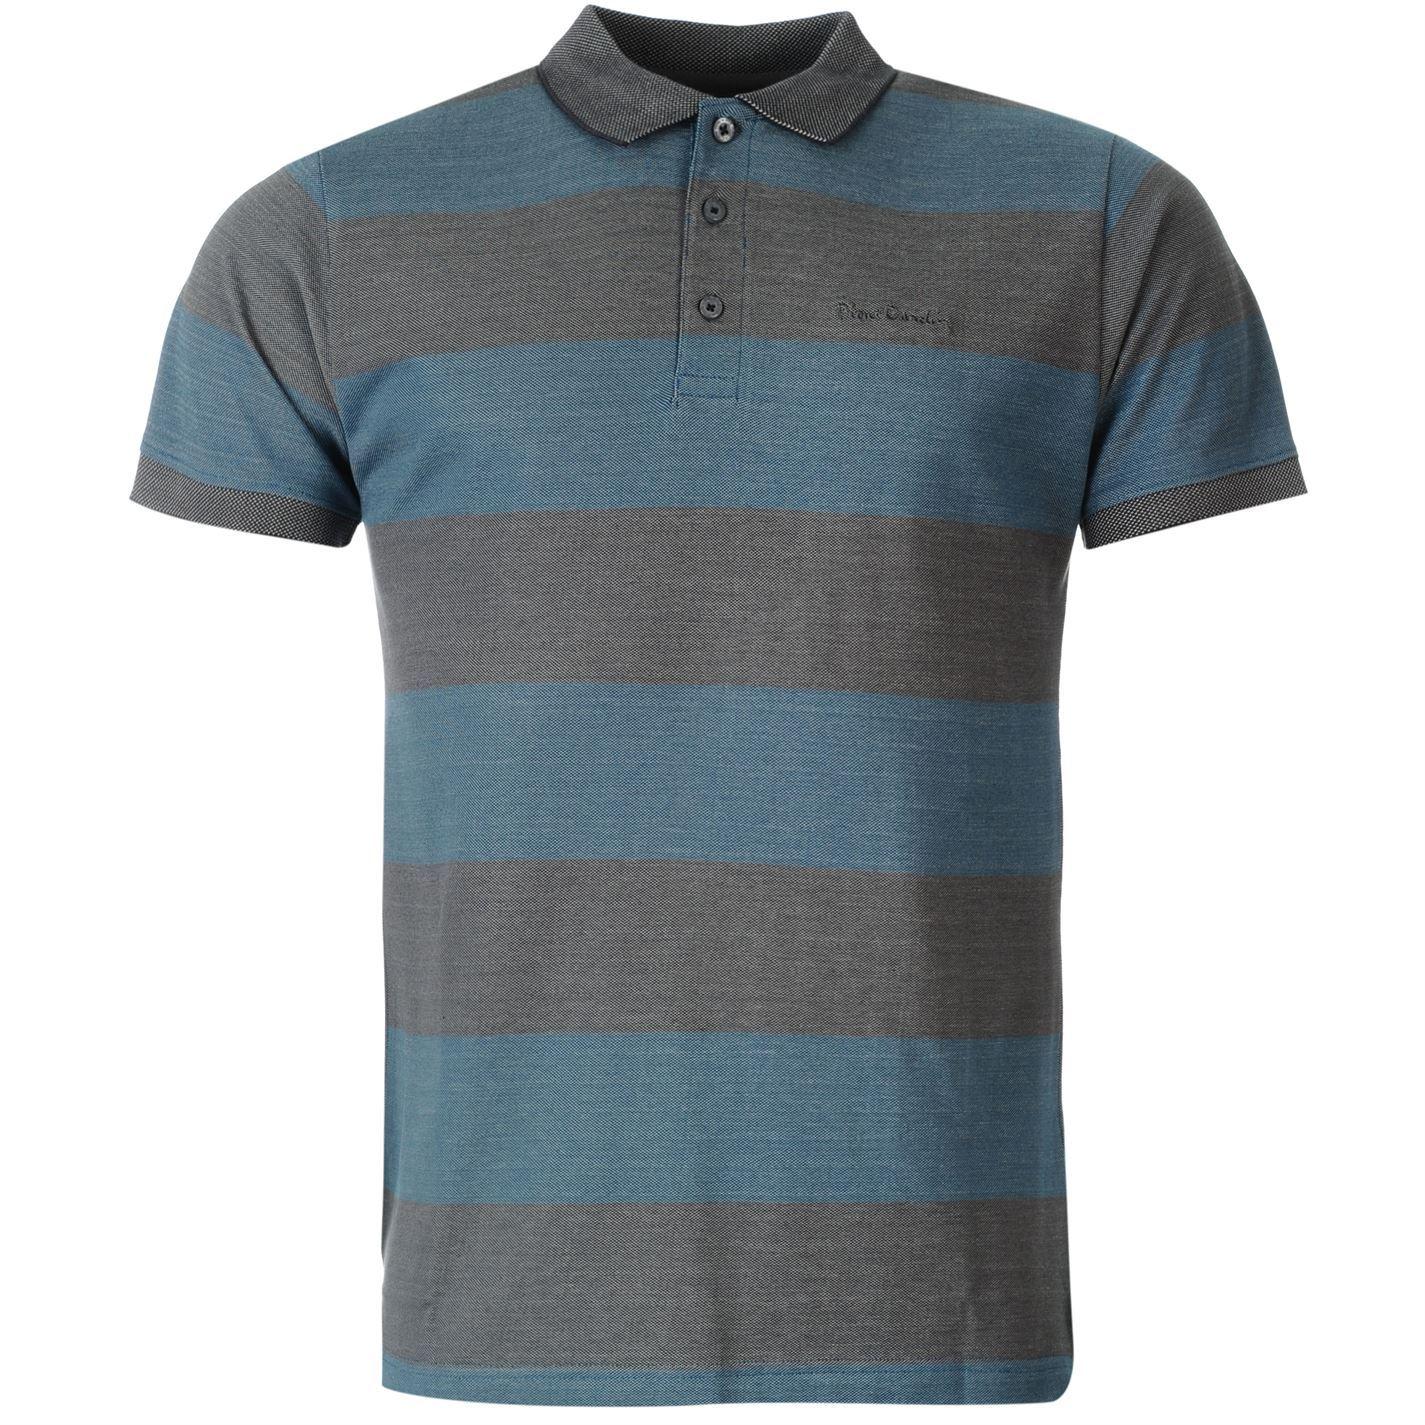 pierre cardin mens stripe polo shirt t shirt tee top. Black Bedroom Furniture Sets. Home Design Ideas